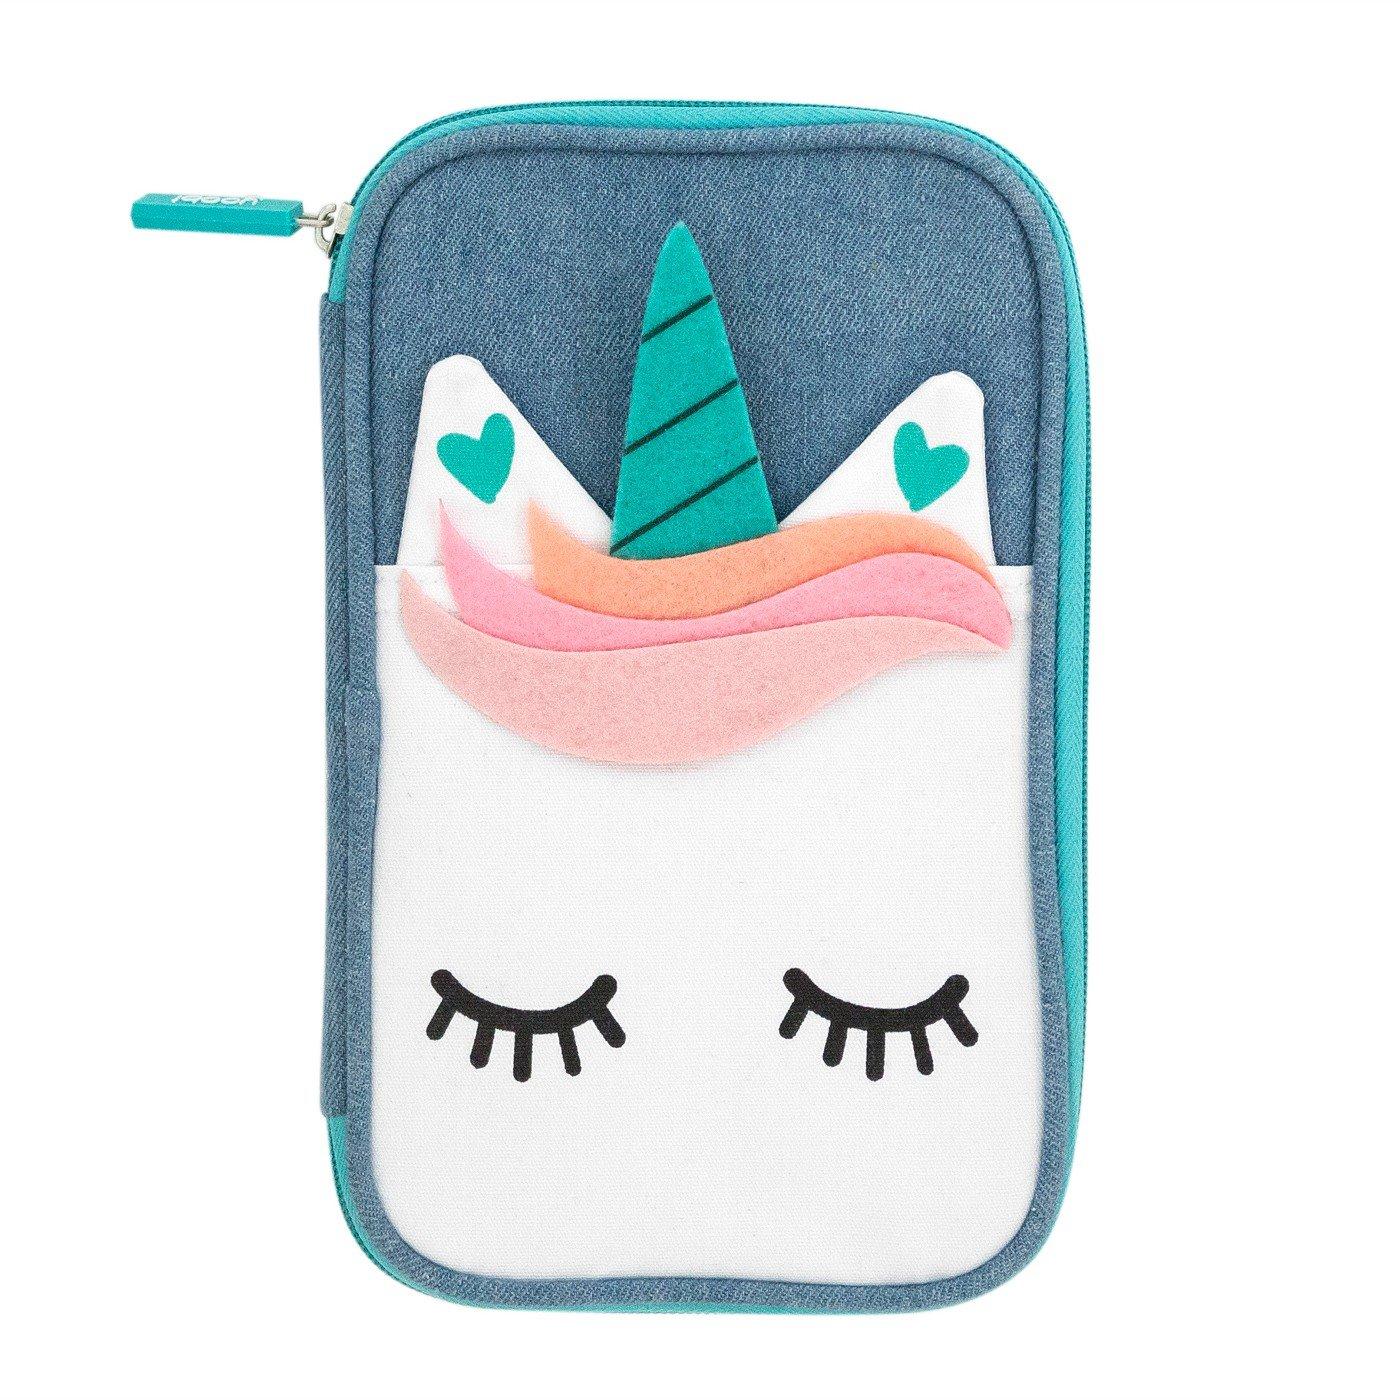 Yoobi Denim Unicorn Pencil Case